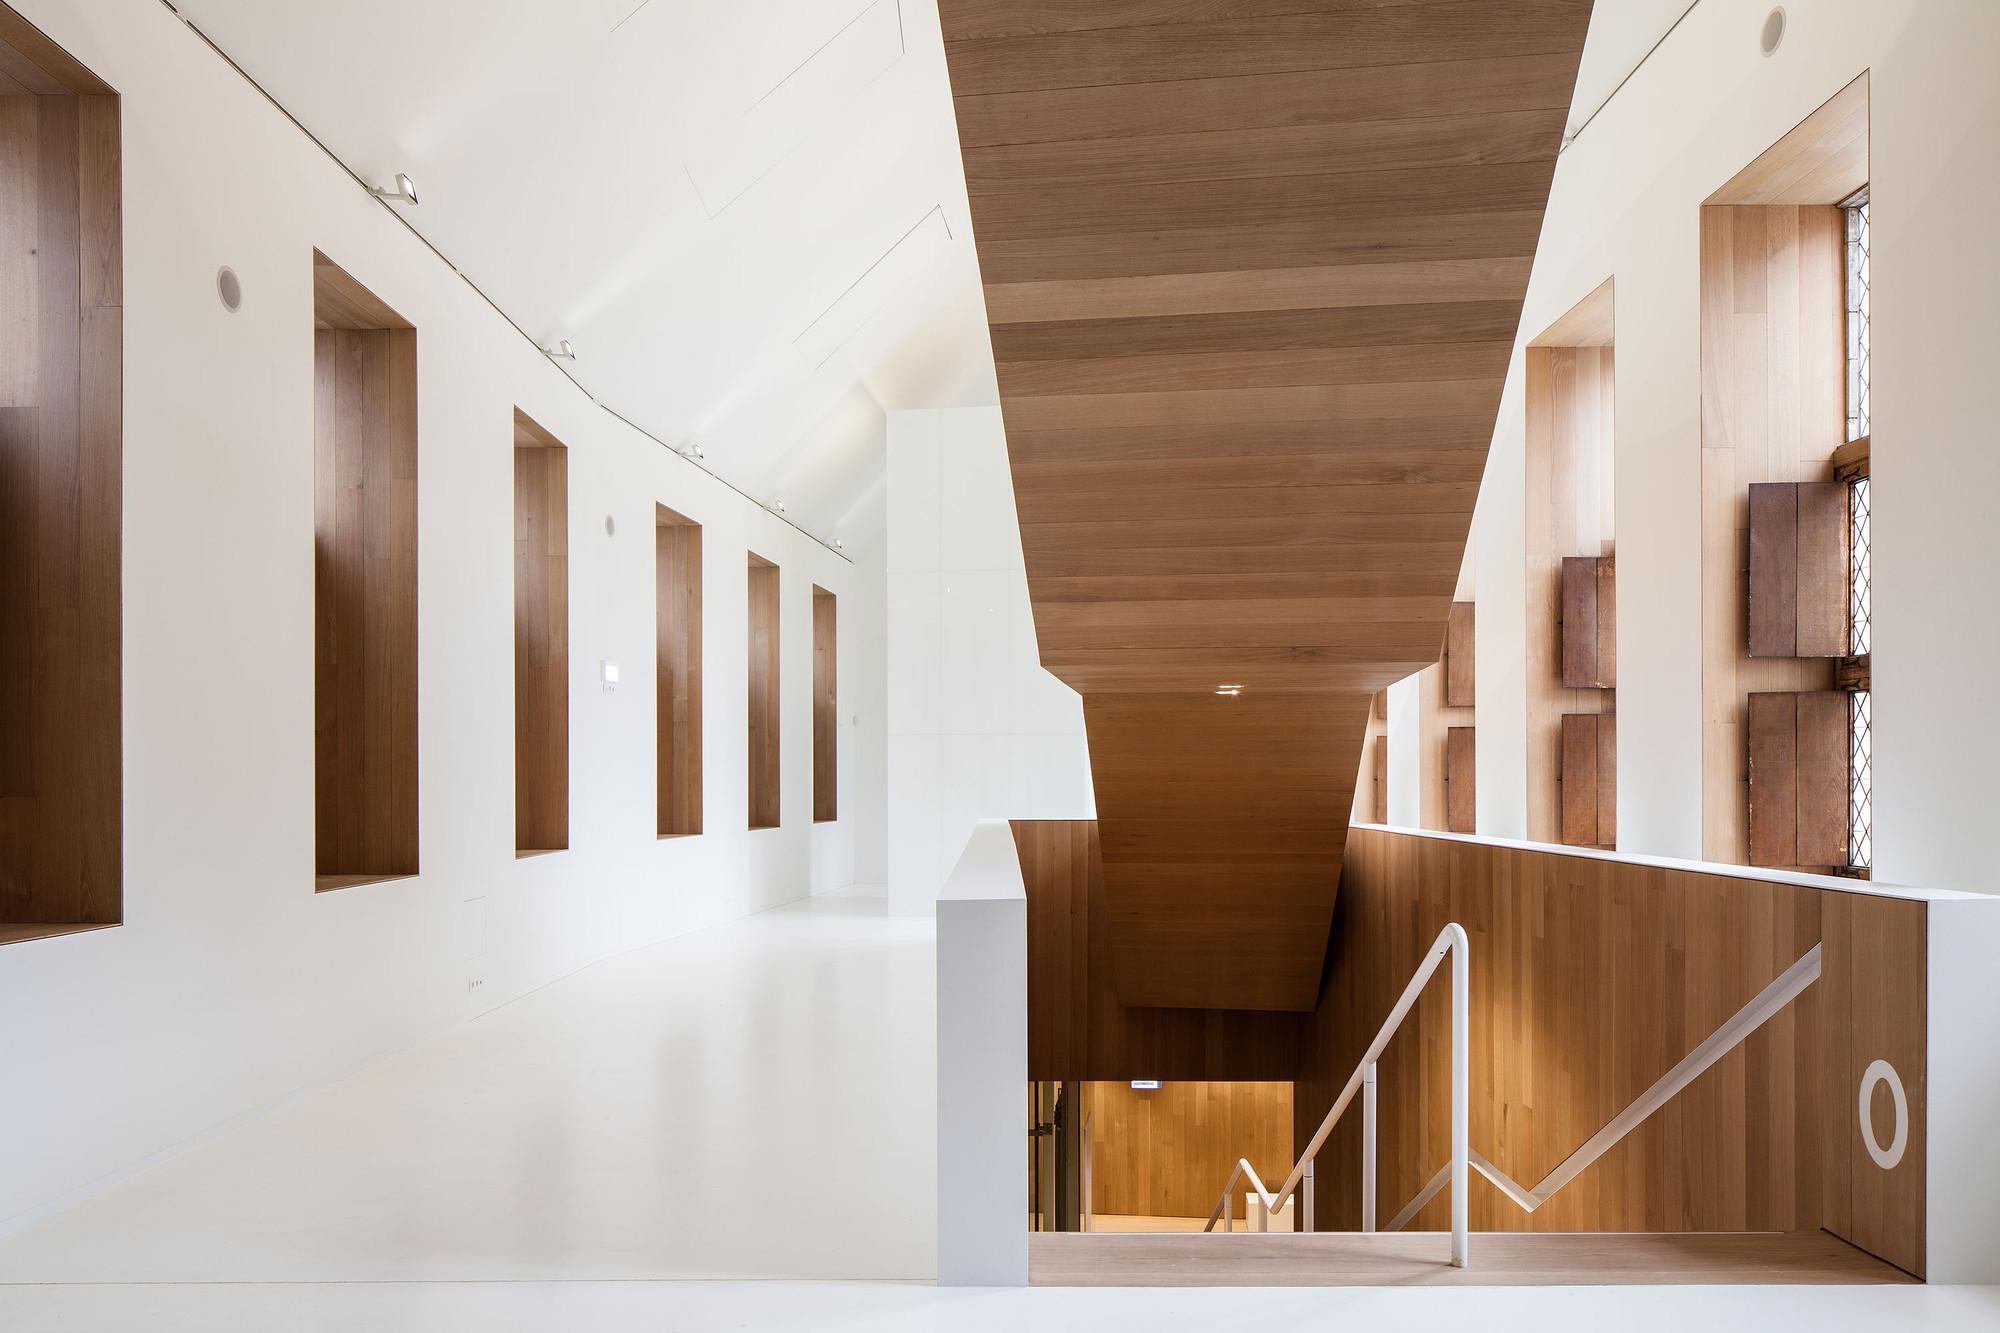 Renewal 'Stedelijk Museum Hof van Busleyden'  / dmvA architecten  +  Hlc.r architect, © Frederik Vercruysse